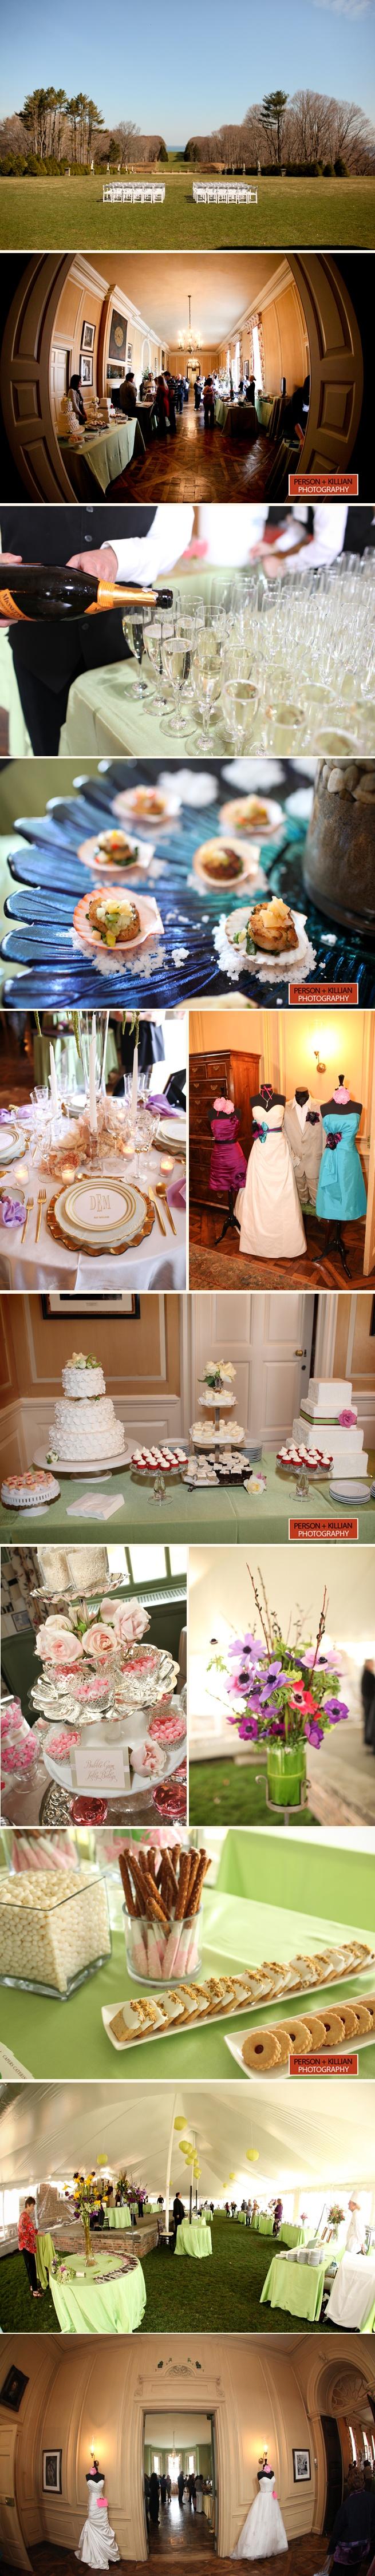 Crane Estate at Castle Hill Wedding Photography | Seaside Wedding Show 2011 - Person + Killian Photography